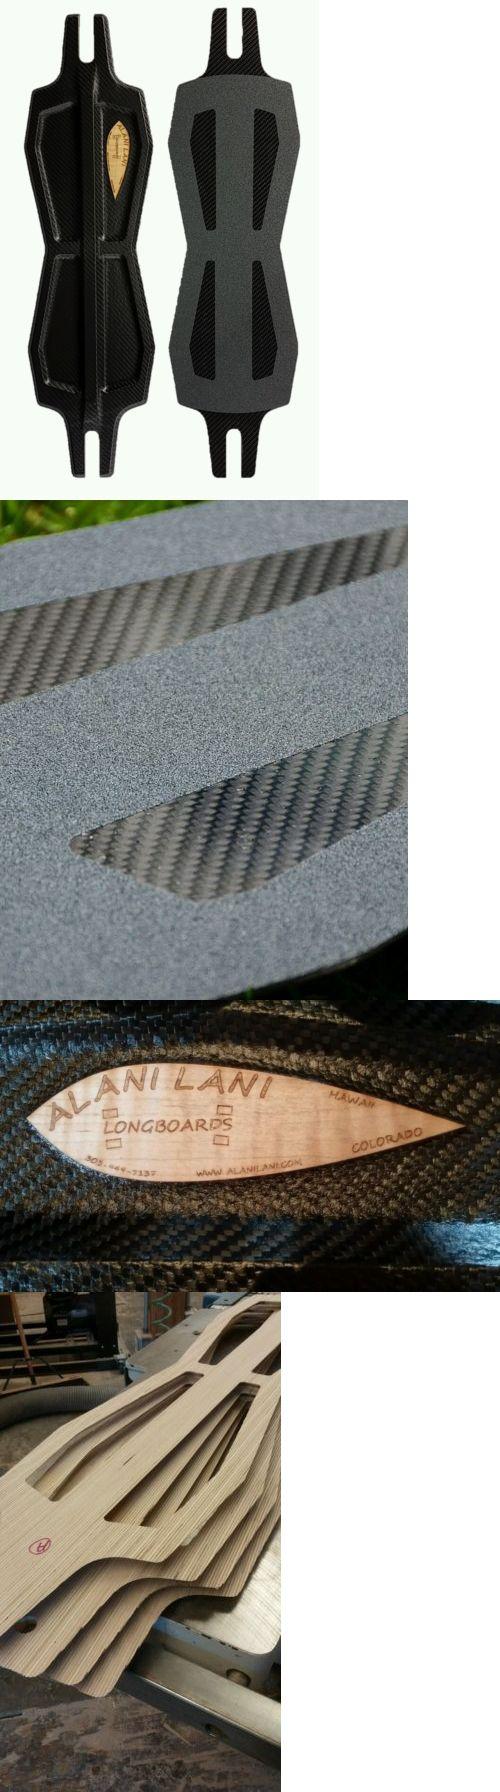 Decks 165944: Alani Lani 36 Keahi, Longboard Deck - Firm , Drop Through, Push, Paddle, Carbon -> BUY IT NOW ONLY: $369 on eBay!